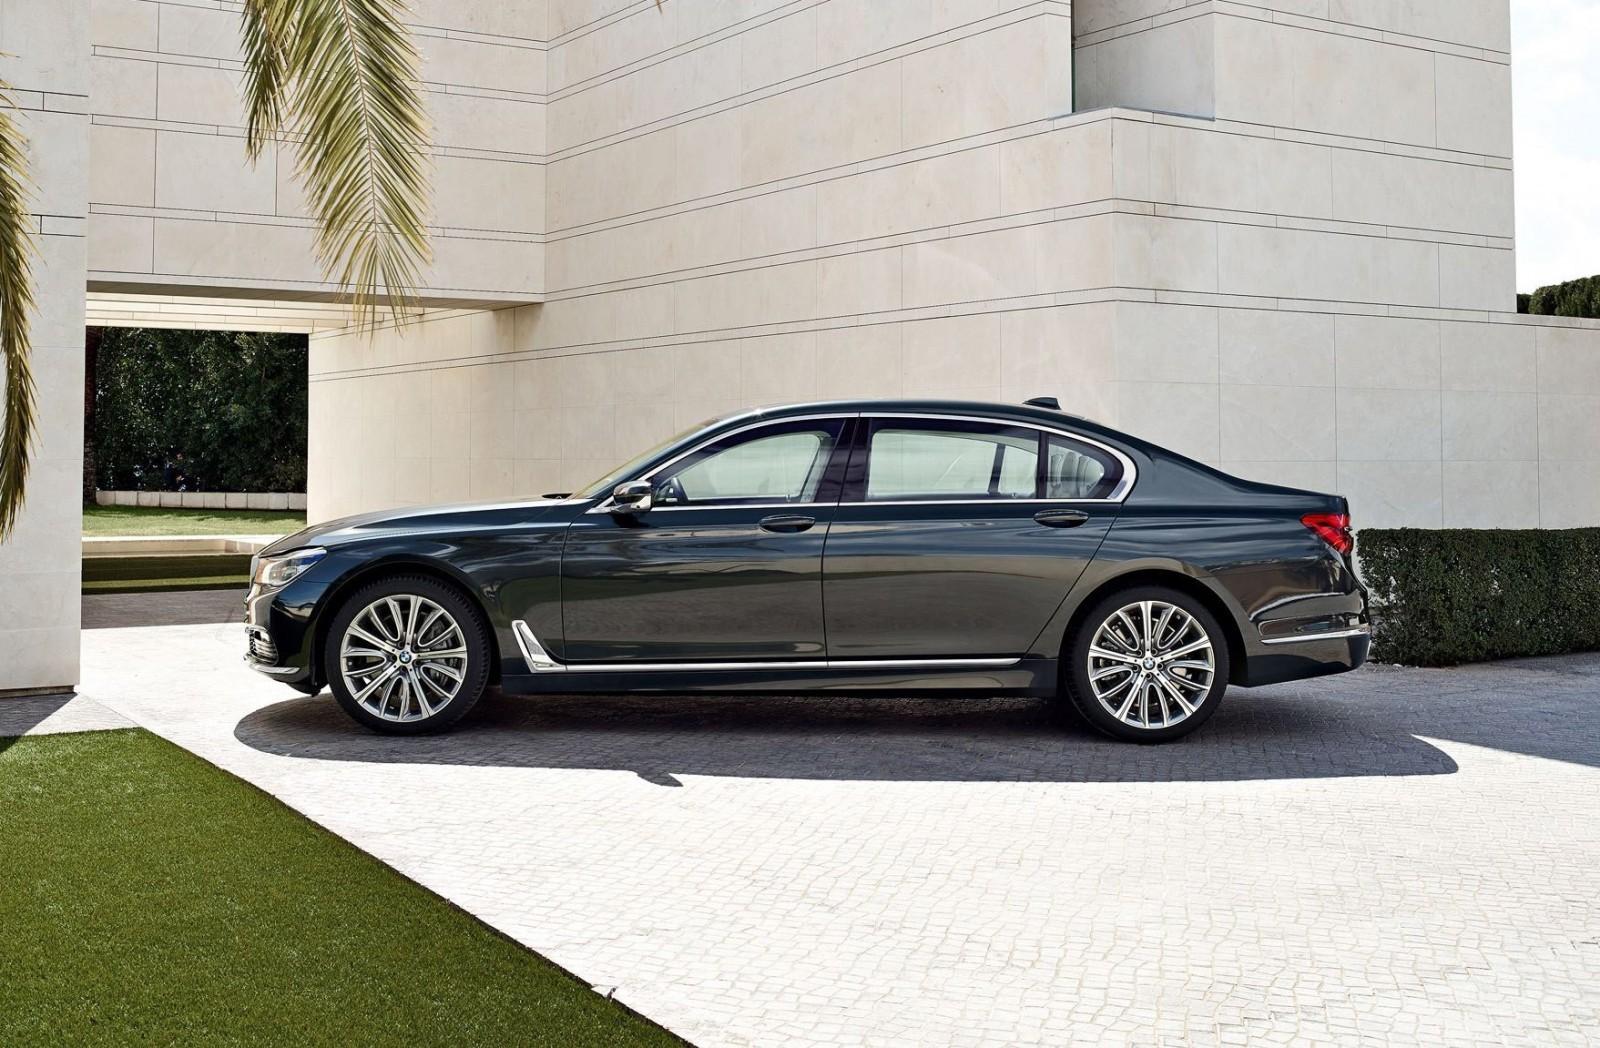 2016 BMW 750 Exterior Photos 24